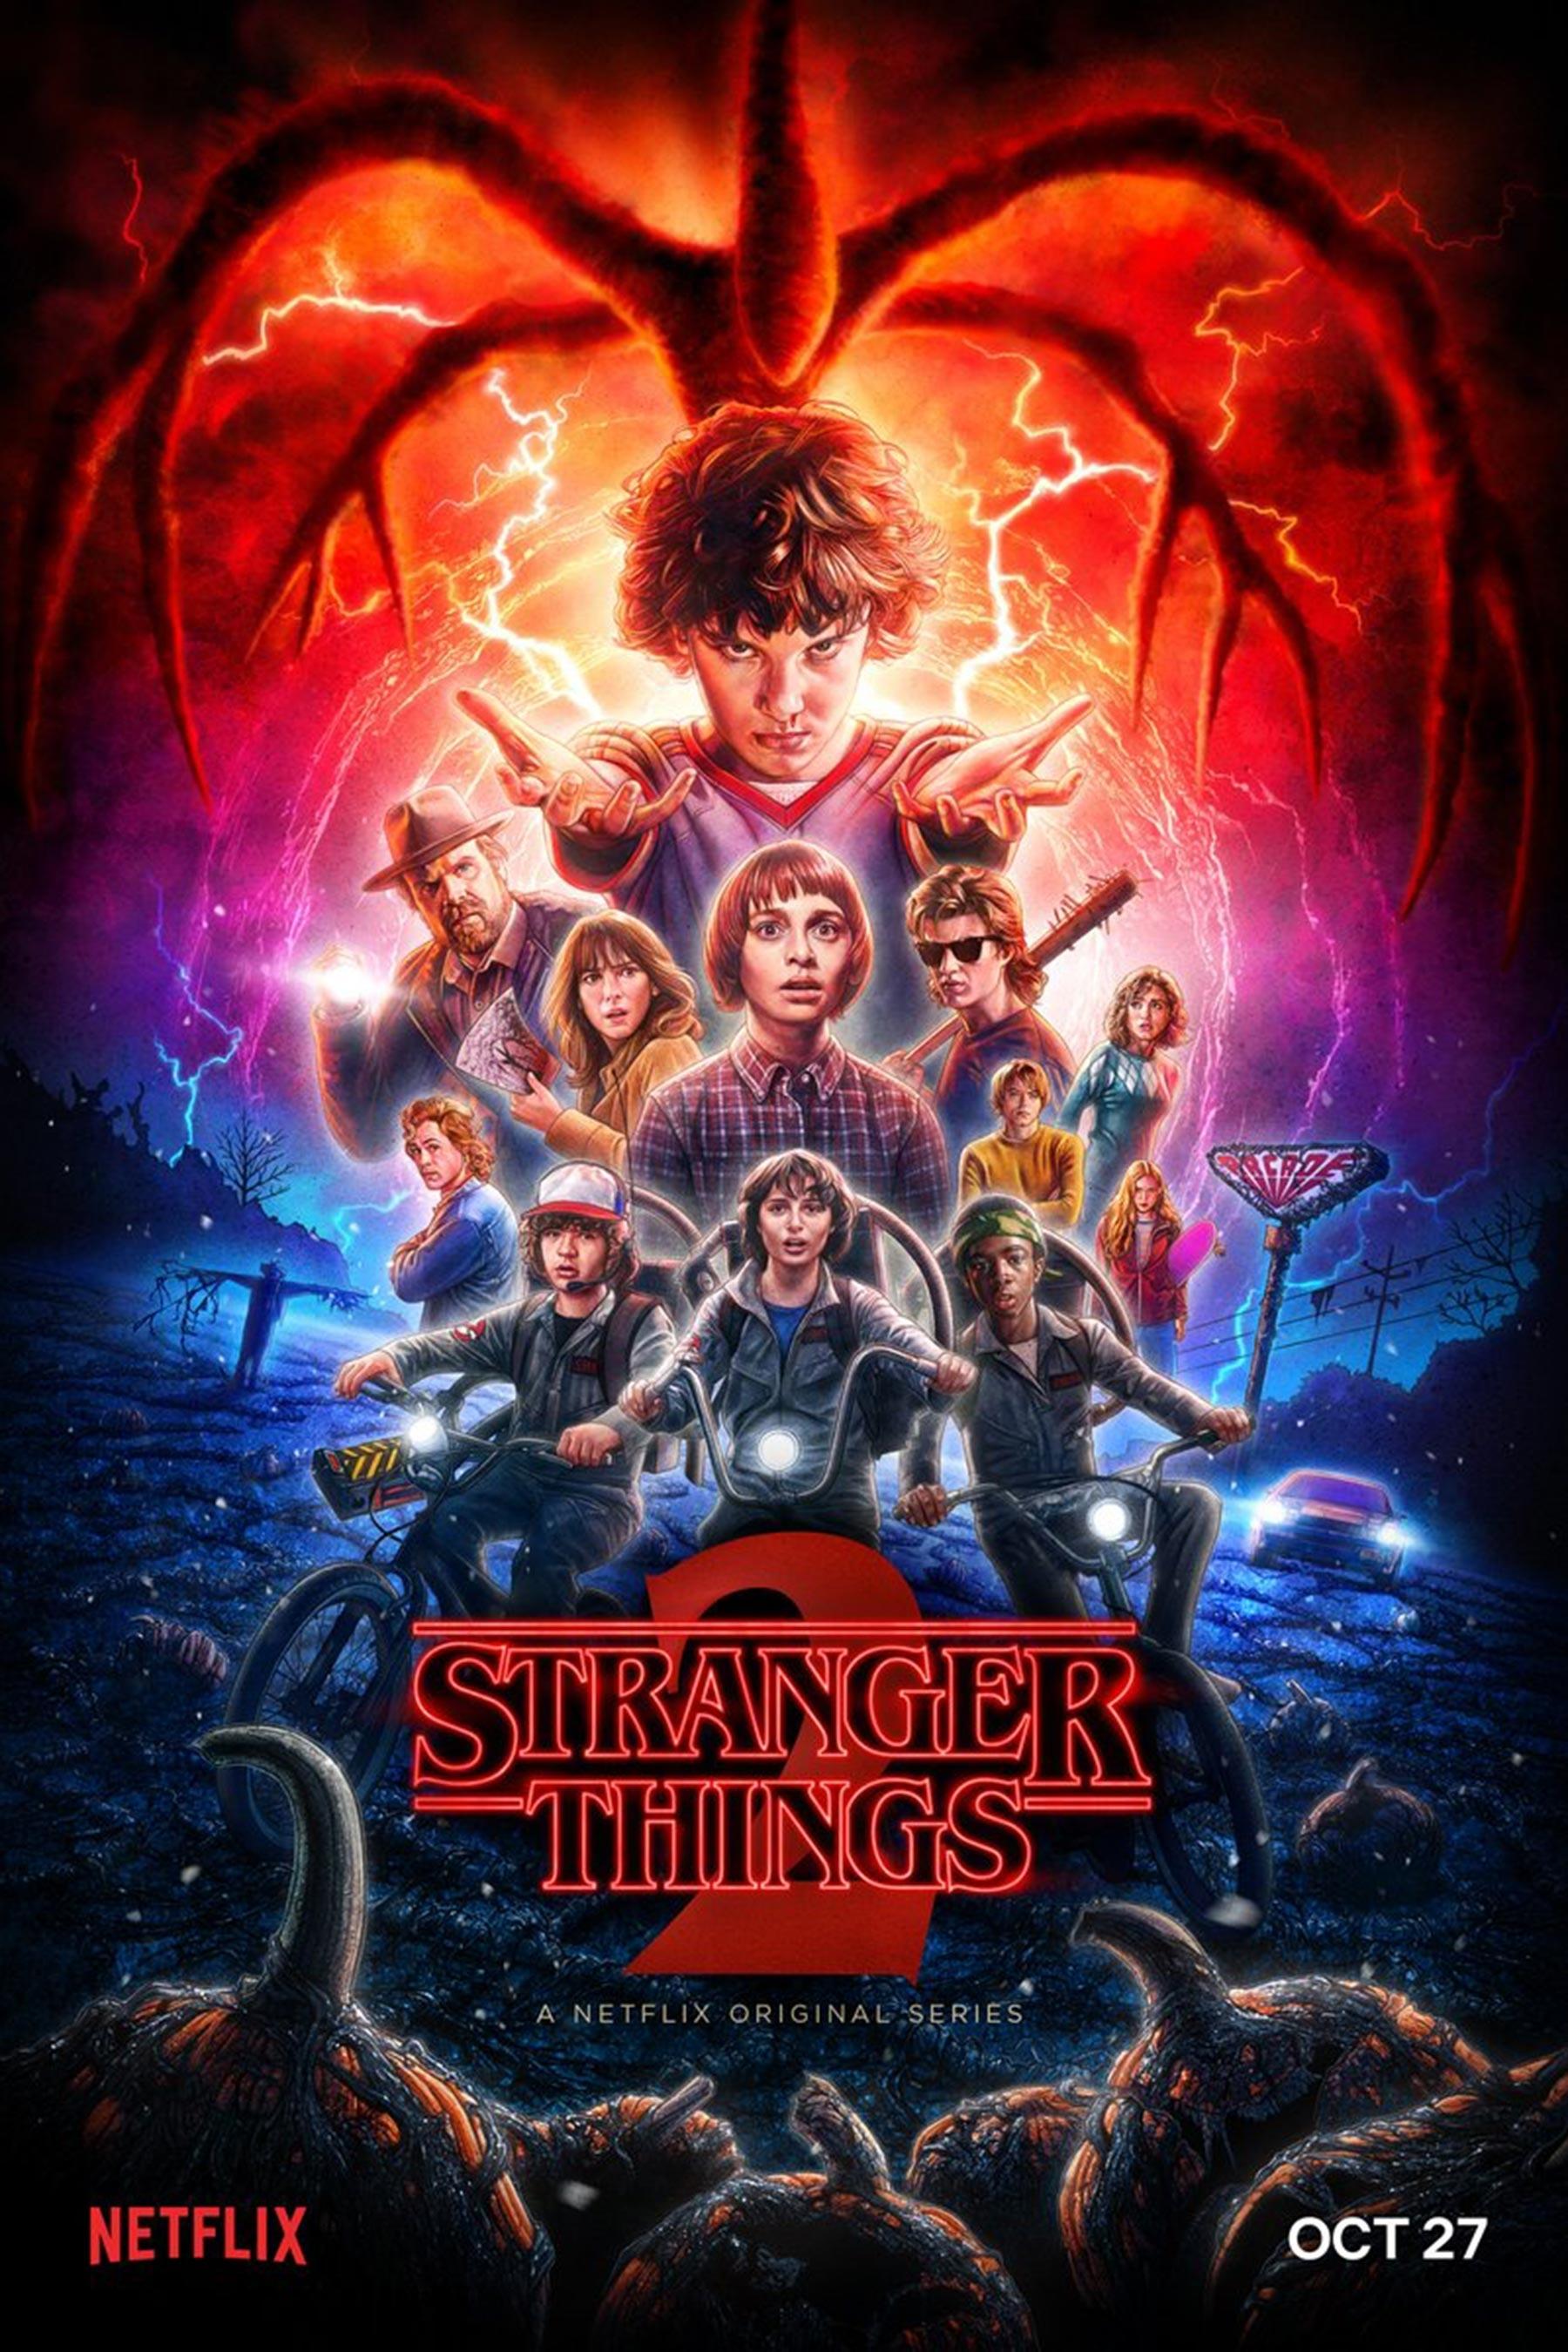 stranger things season 2 gets halloween-themed poster | ew